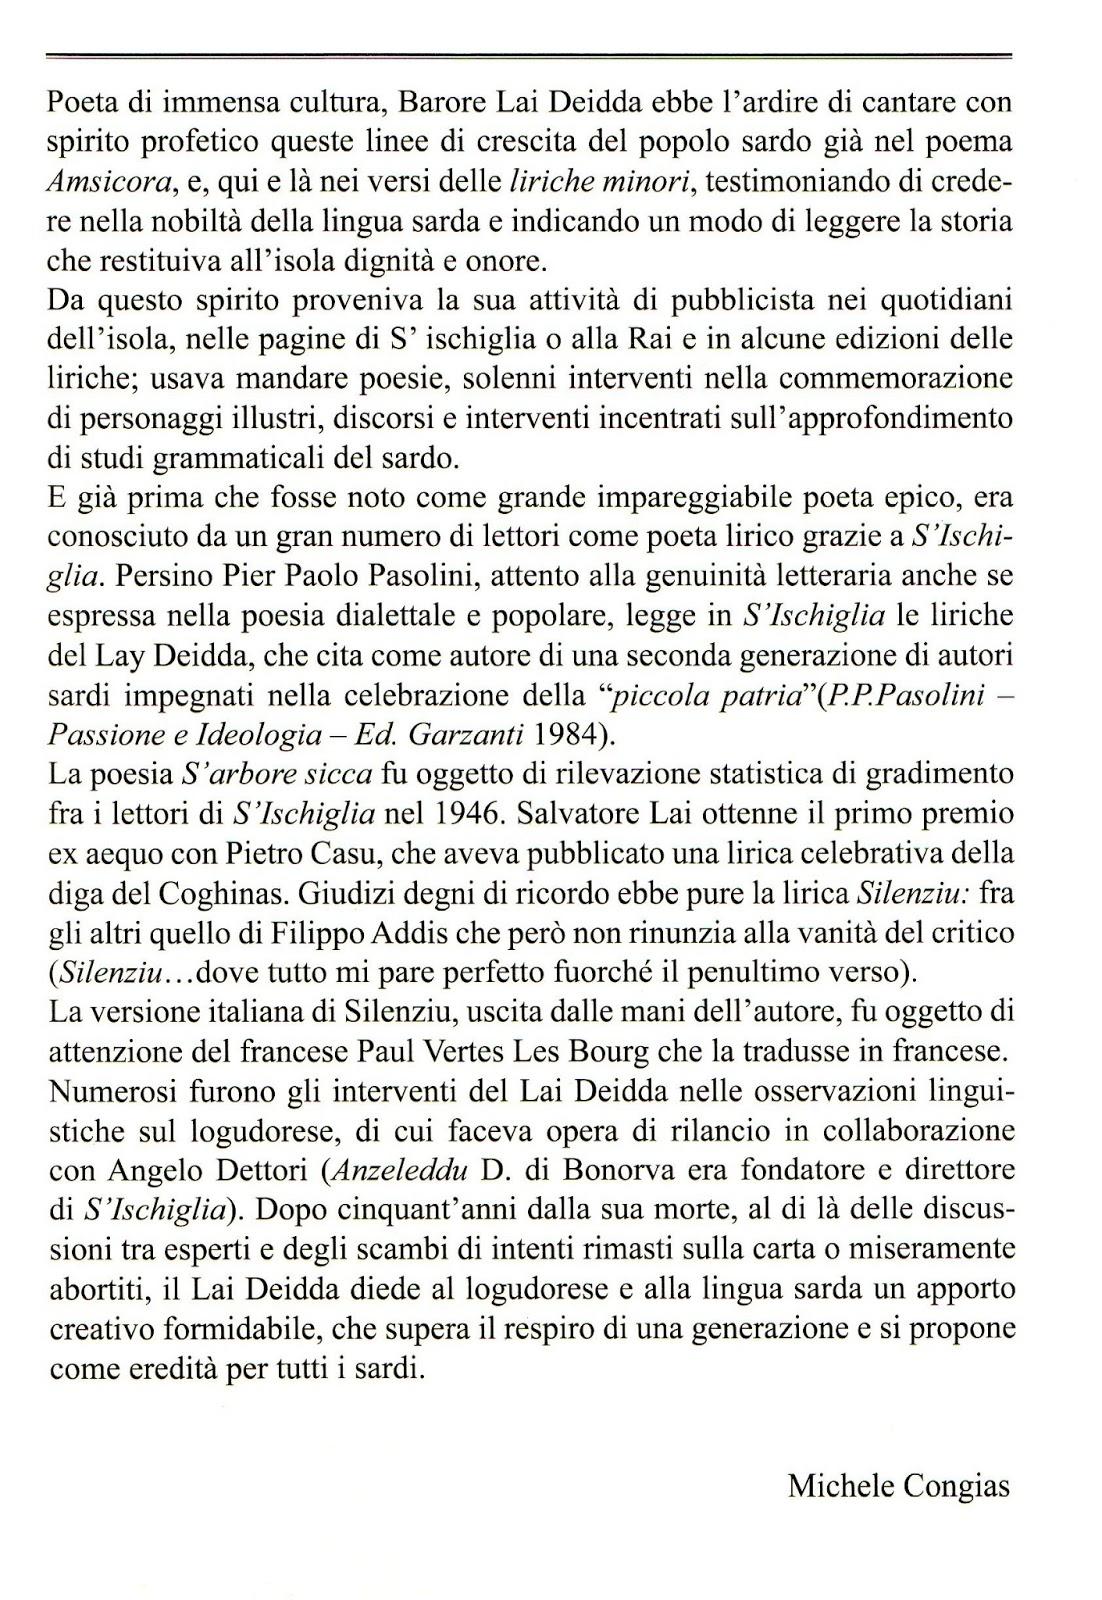 letter of interest for promotion template - tonara blog cantos de monte salvatore lai deidda a cura